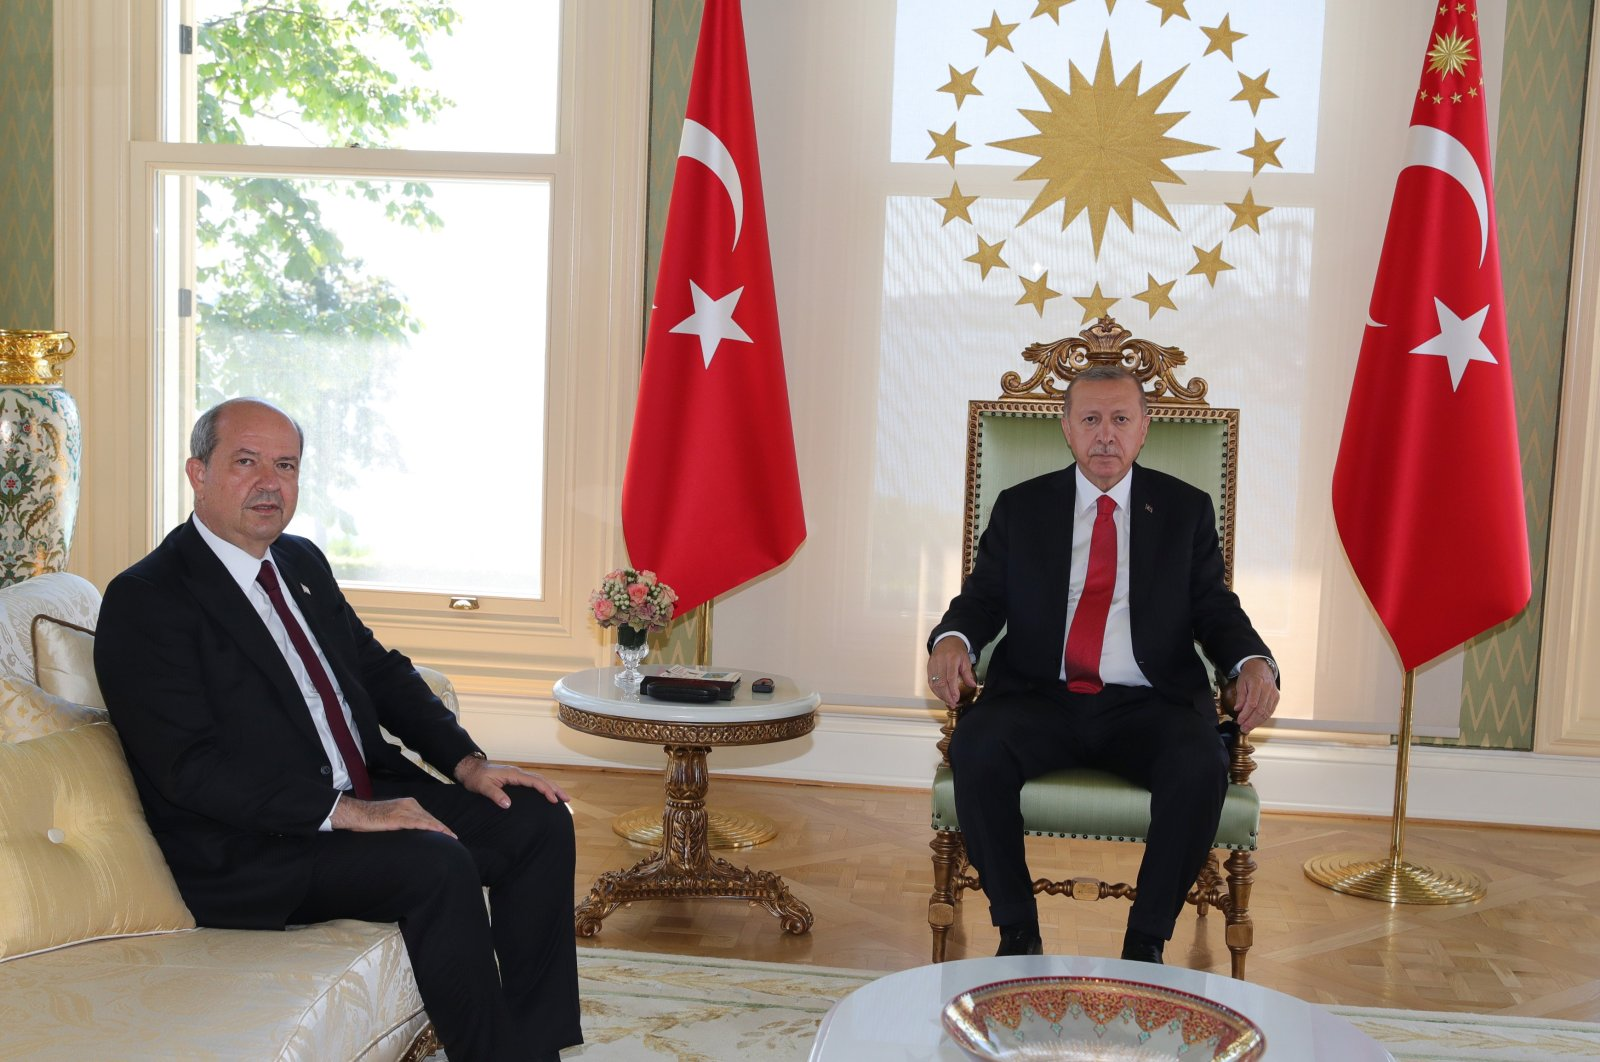 President Recep Tayyip Erdoğan receives Turkish Republic of Northern Cyprus (TRNC) Prime Minister Ersin Tatar, August 12, 2020. (AA Photo)